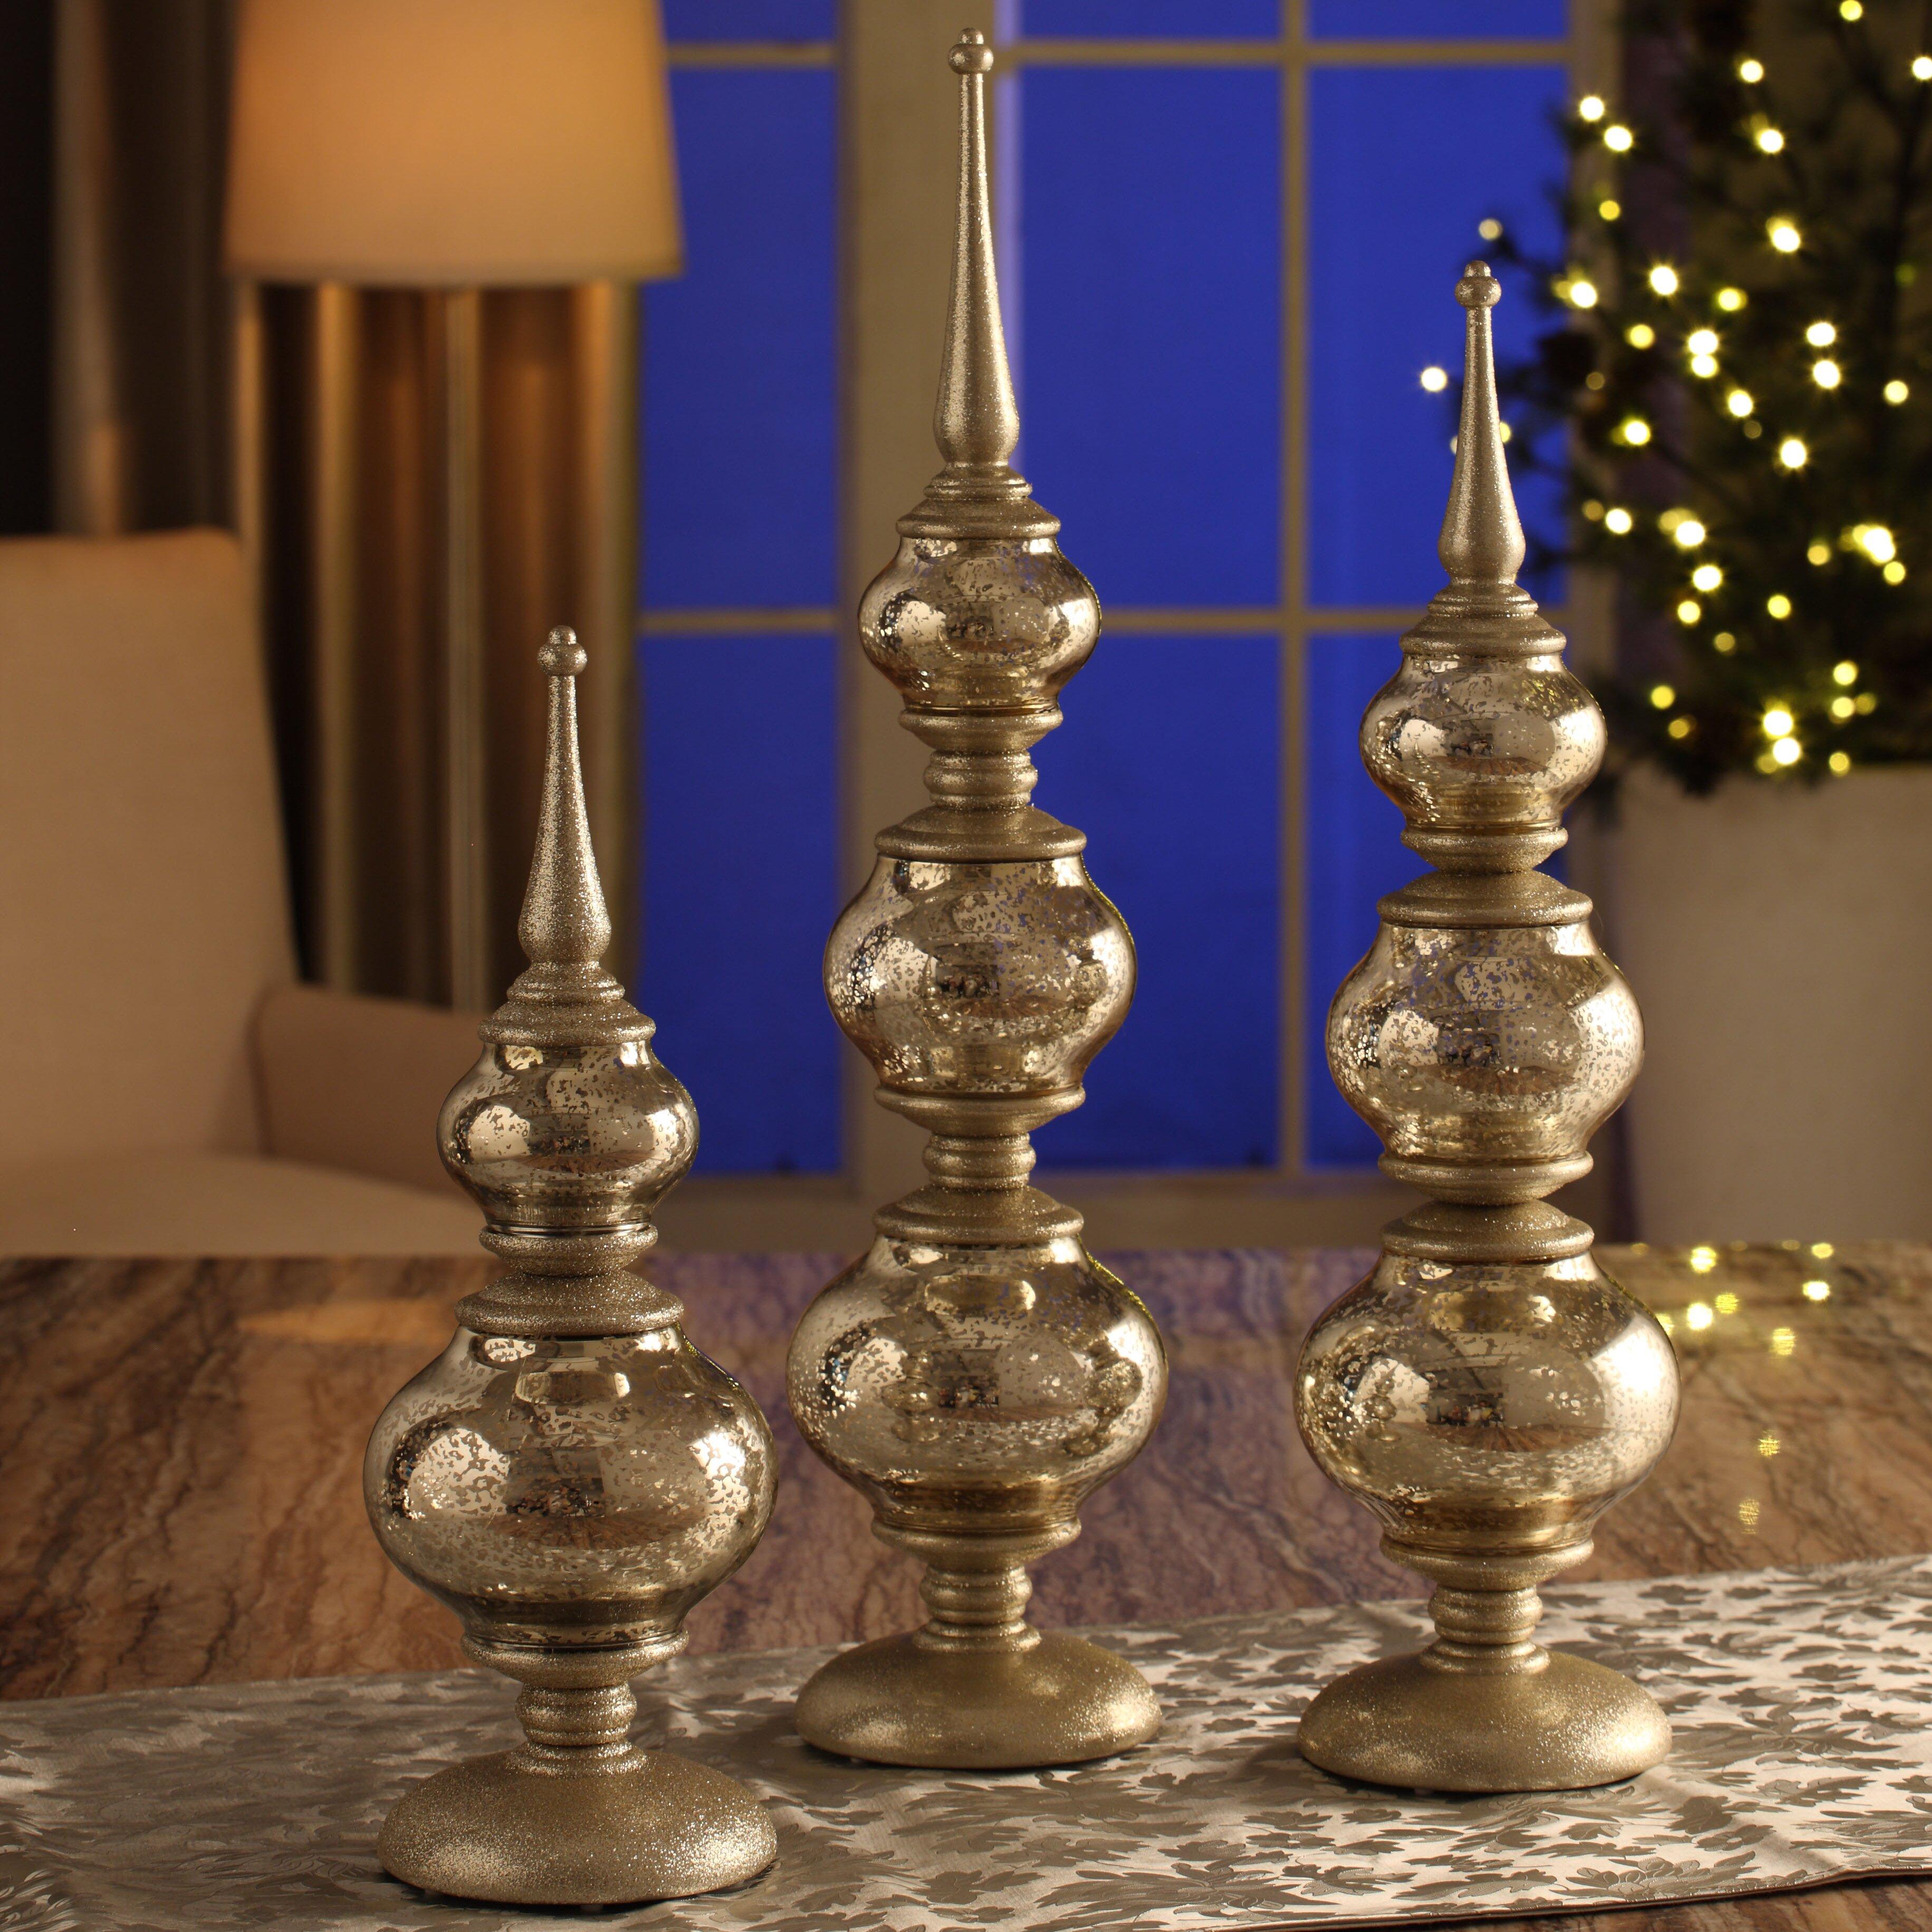 3 Piece Finial Ornament Set Wayfair